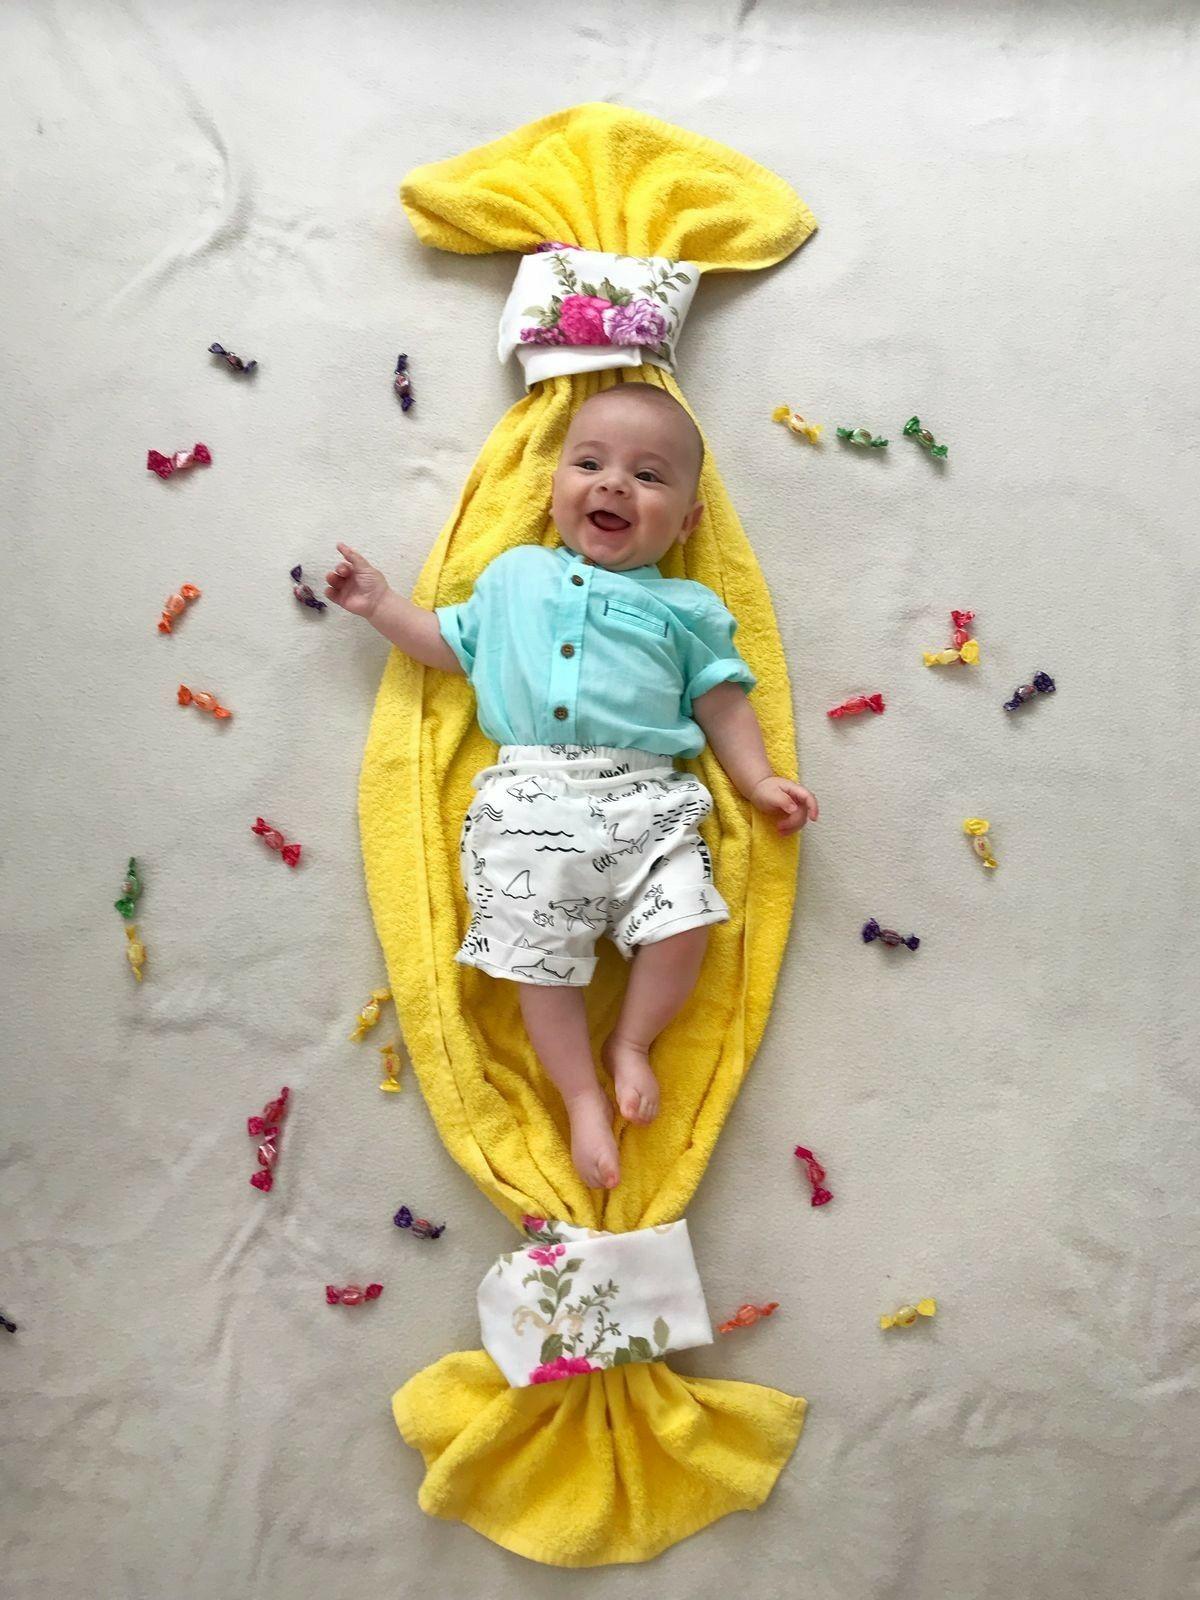 40 Amazing Baby Photoshoot Ideas At Home Diy Baby Photoshoot